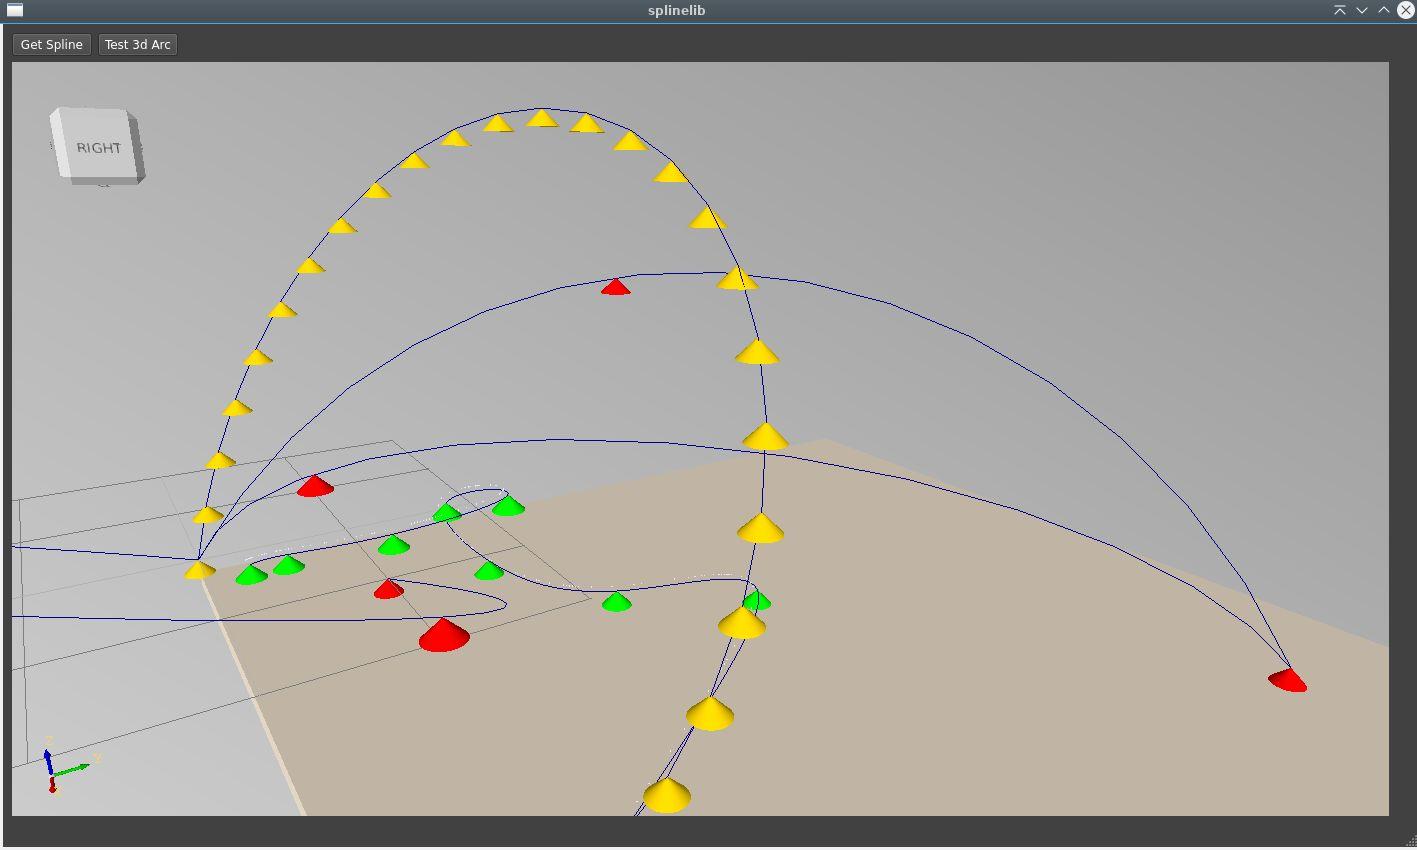 3d-arc-waypoints_2021-05-08.jpg